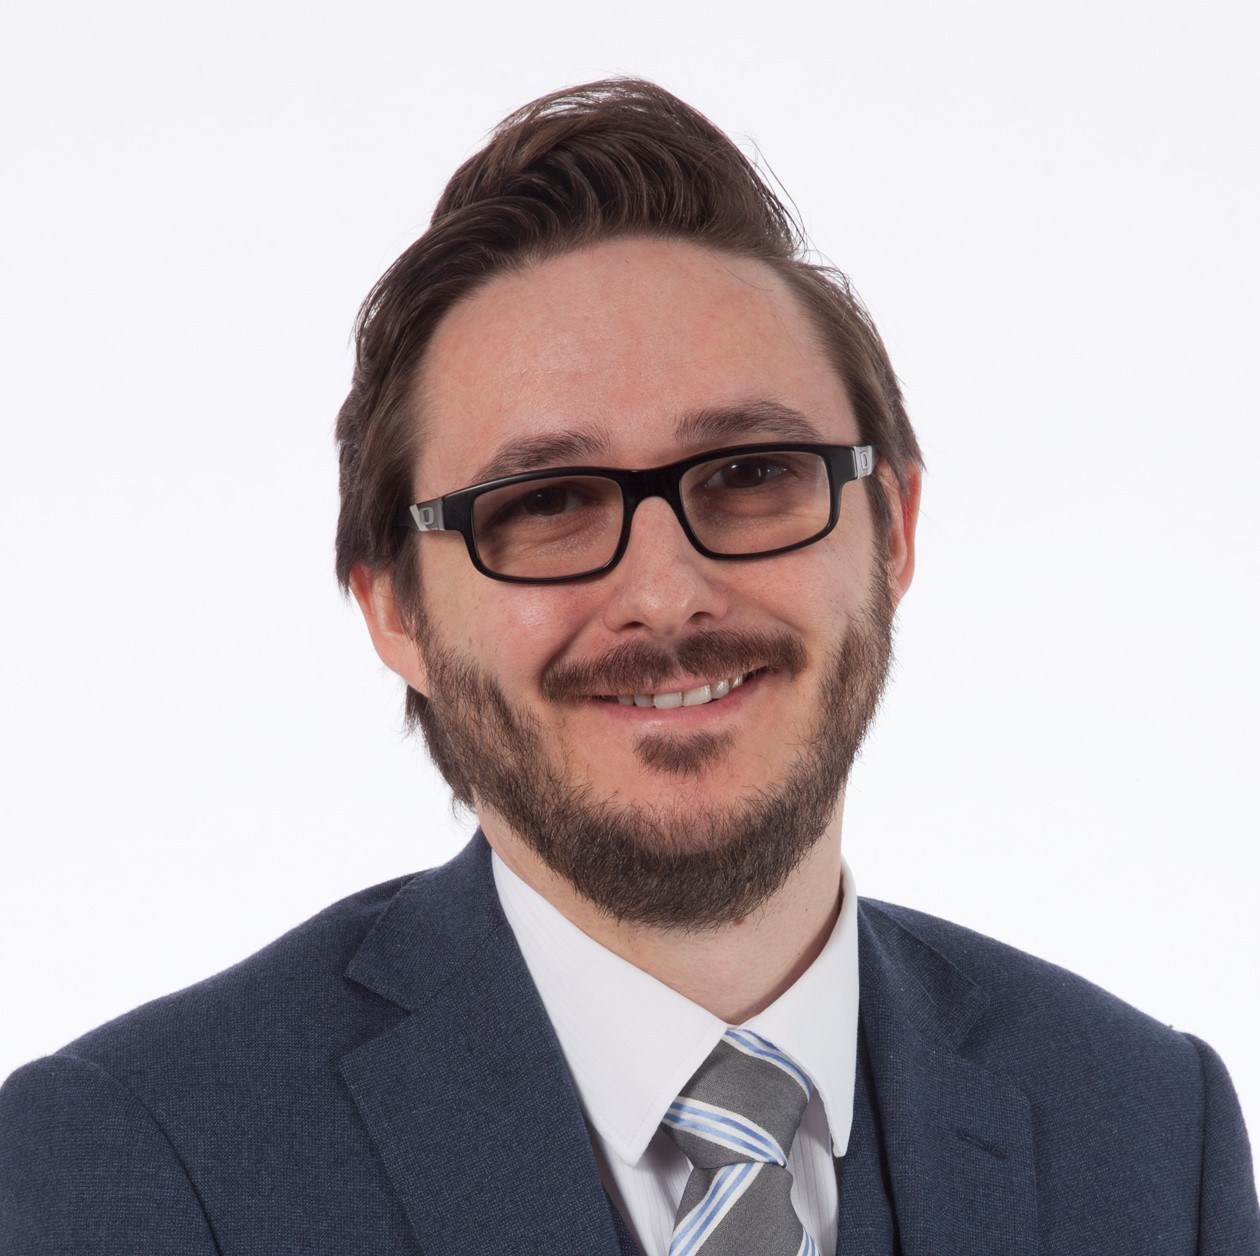 profile picture of stuart mclaughlan